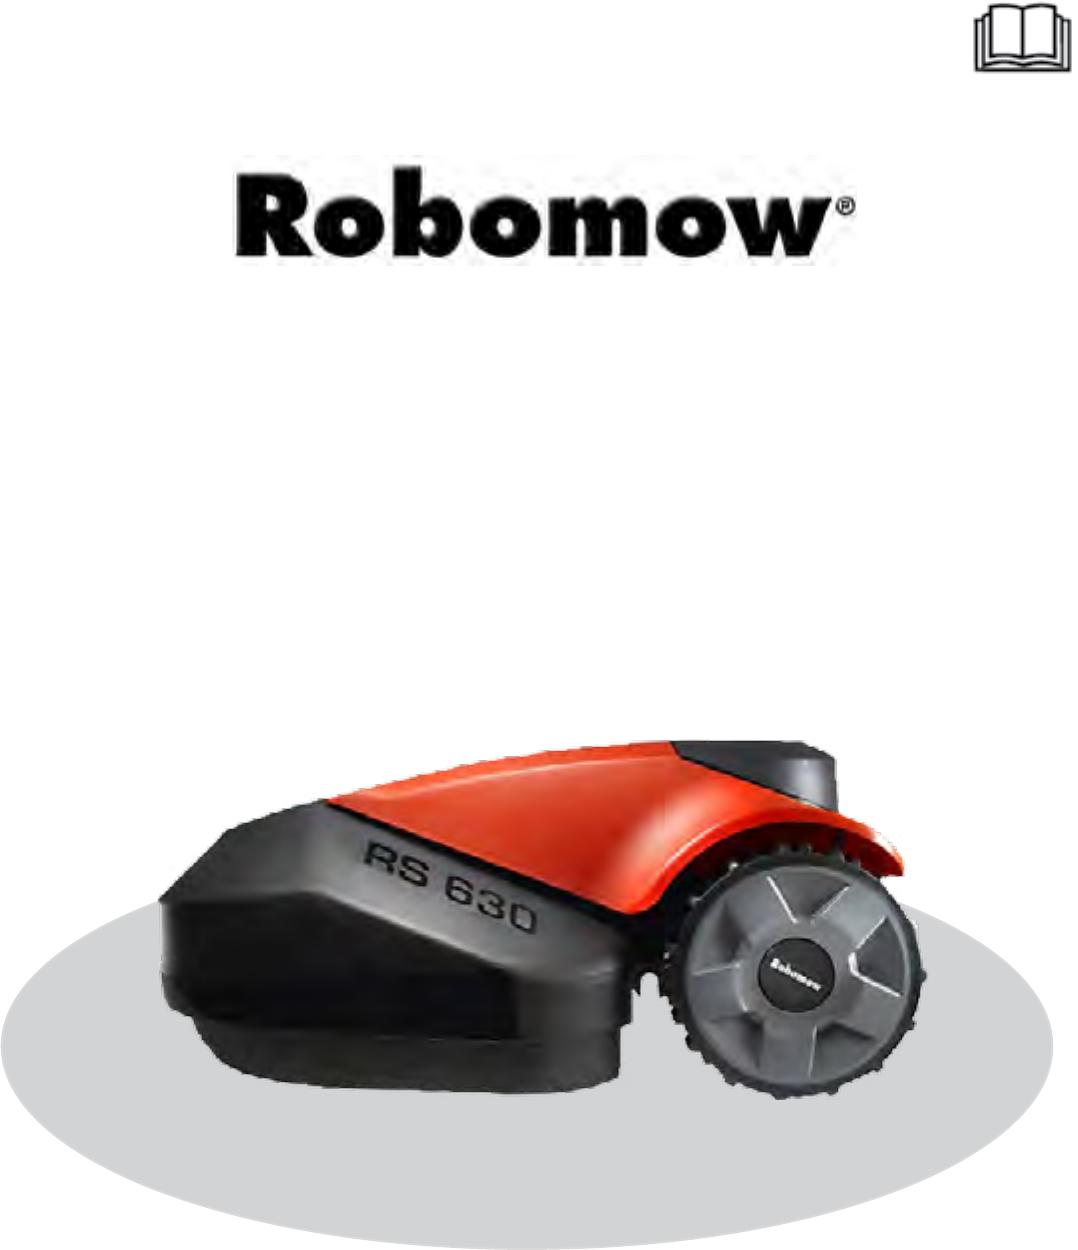 handleiding robomow ms1800 pagina 1 van 54 deutsch. Black Bedroom Furniture Sets. Home Design Ideas